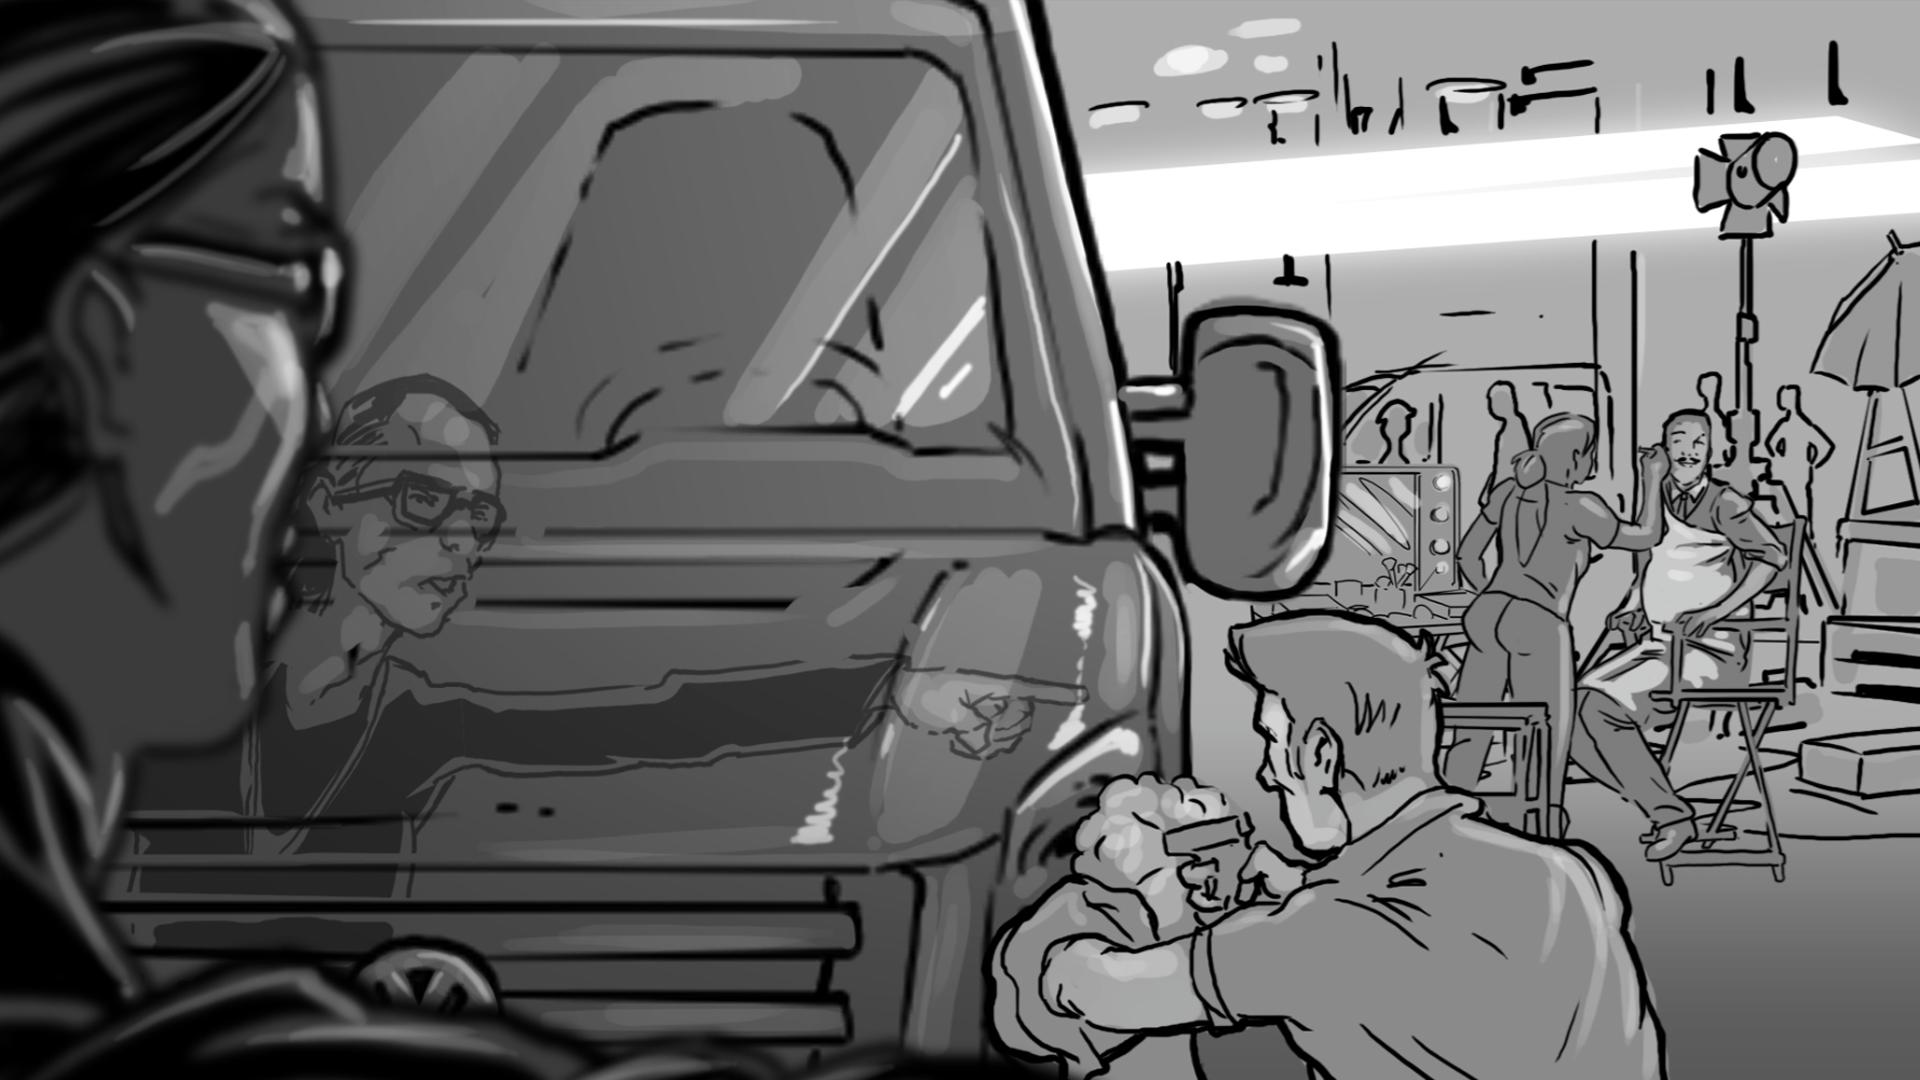 StoryBoard_VOLKSWAGEN CRAFTER_by nooga_Nicolas Agenal_06